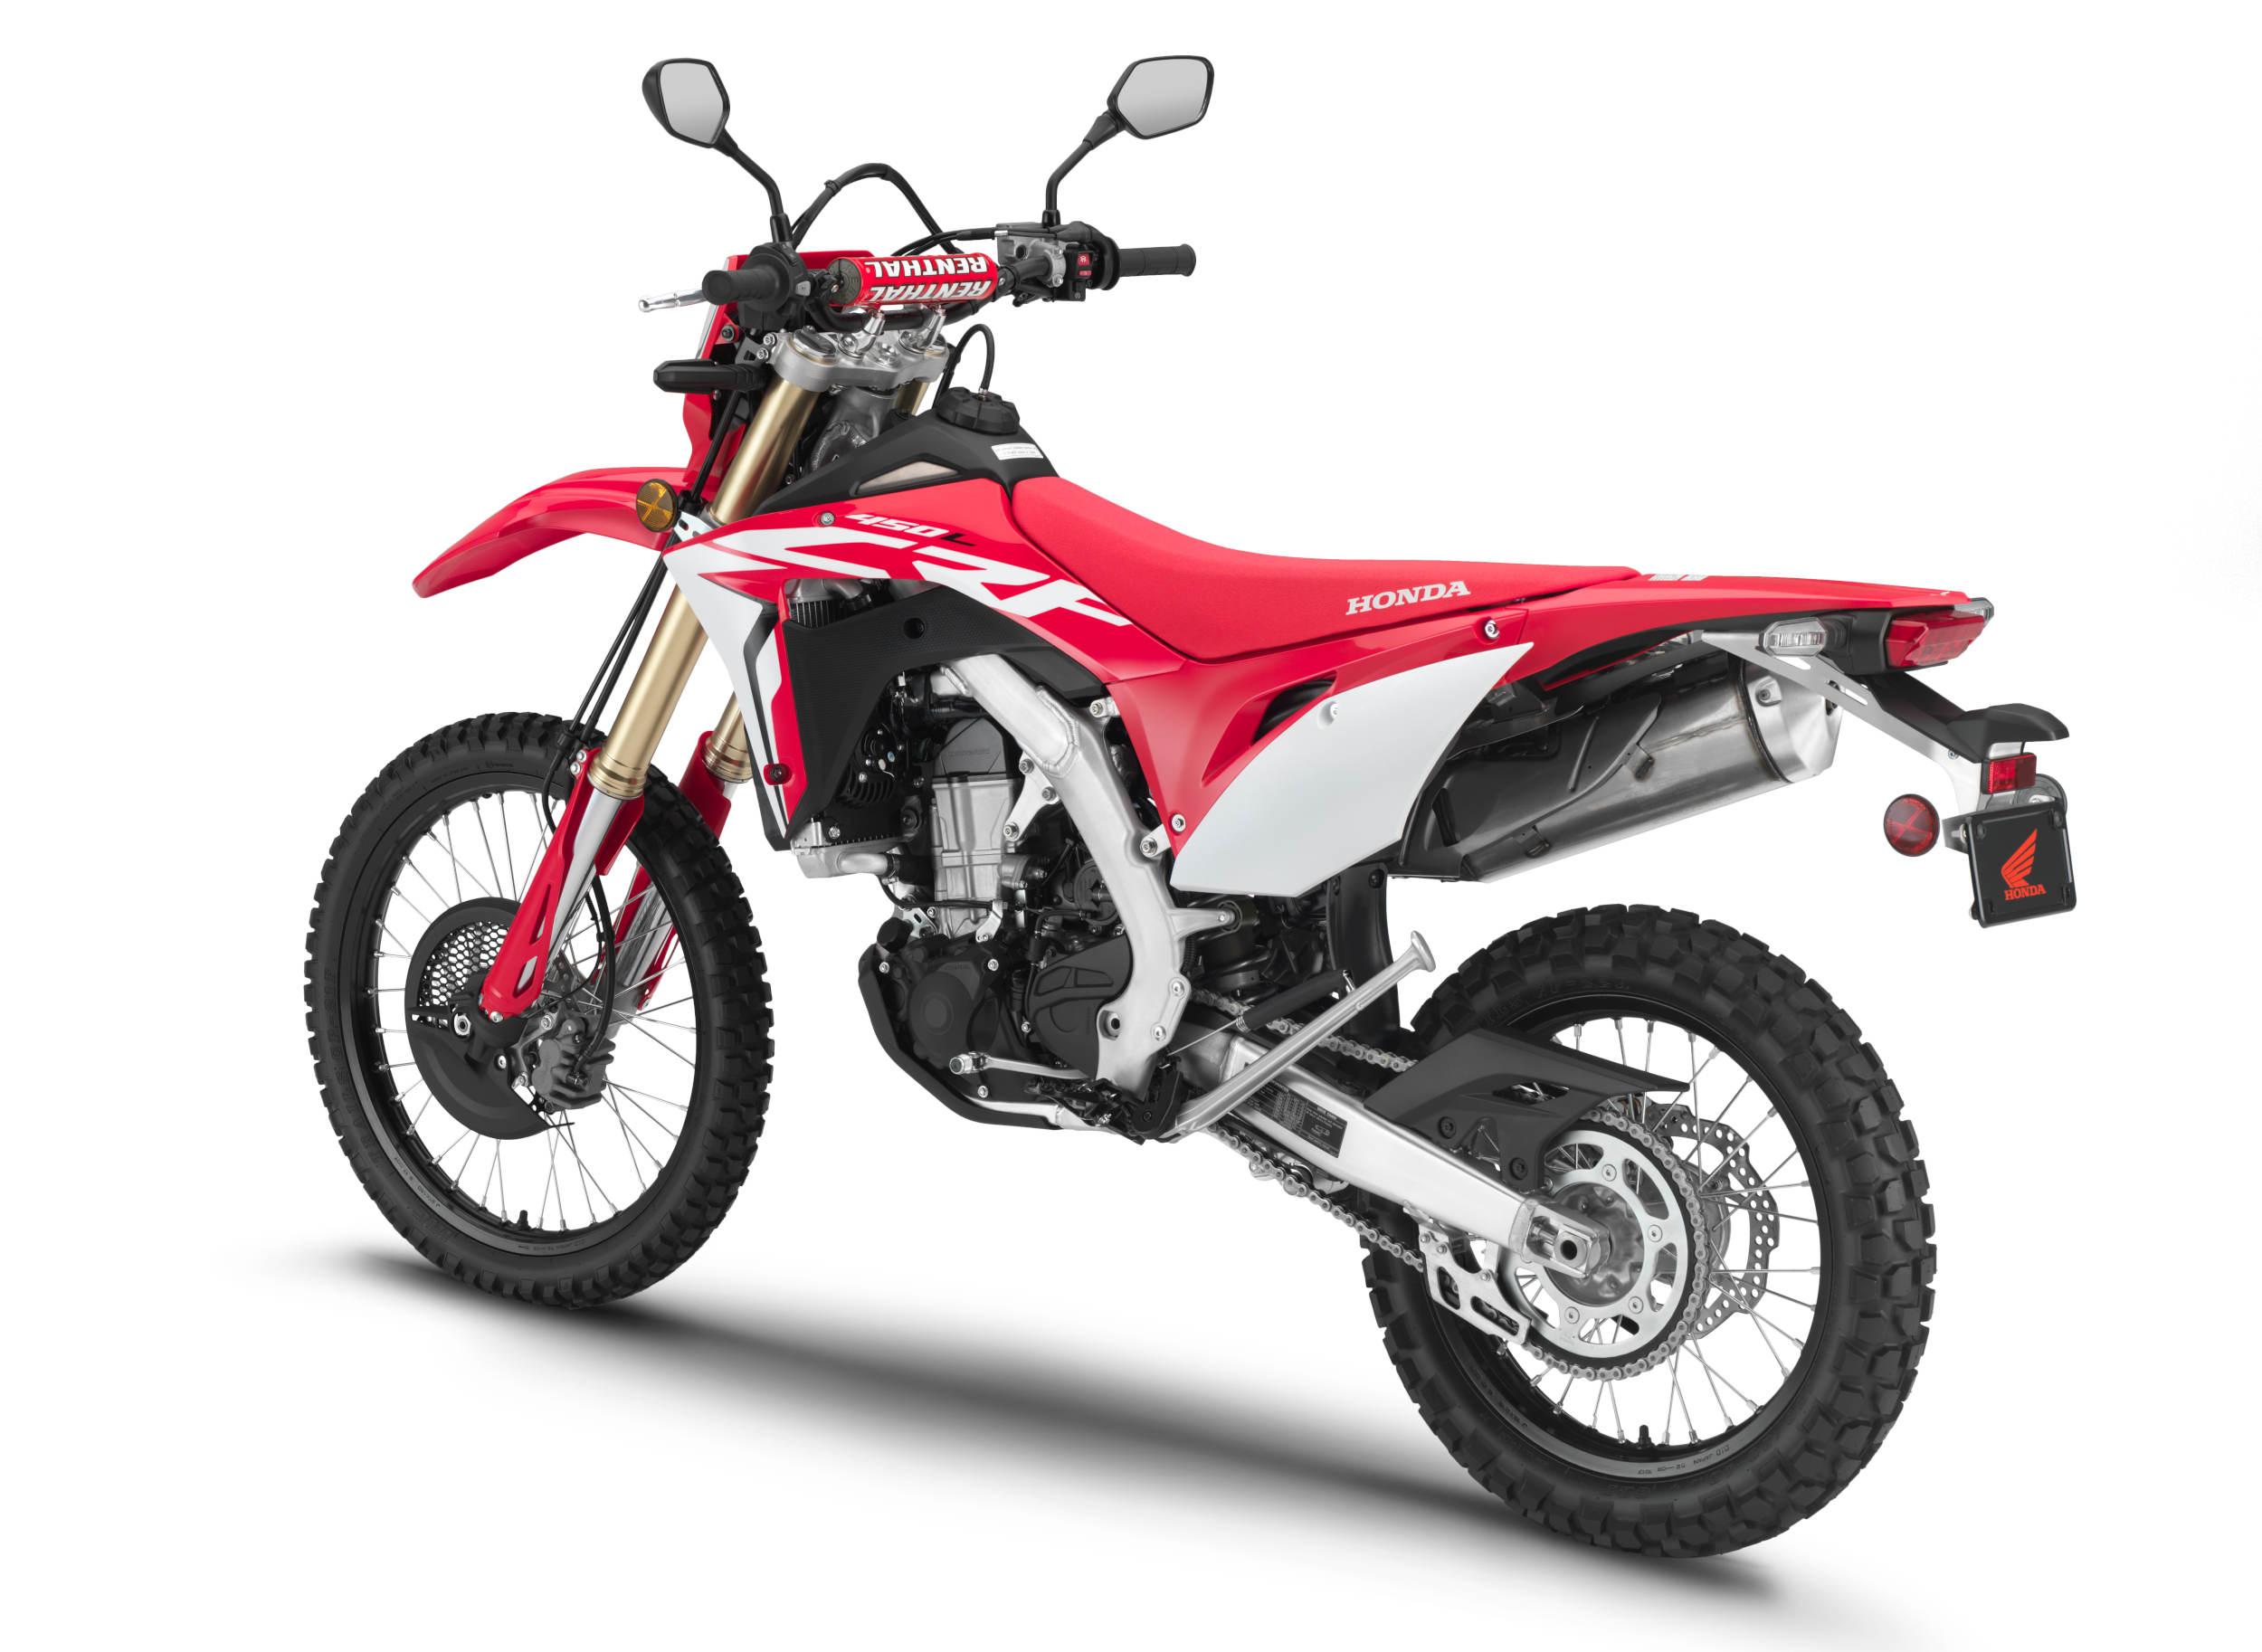 Honda Finally Introduces a Street-Legal 450cc Dual Sport